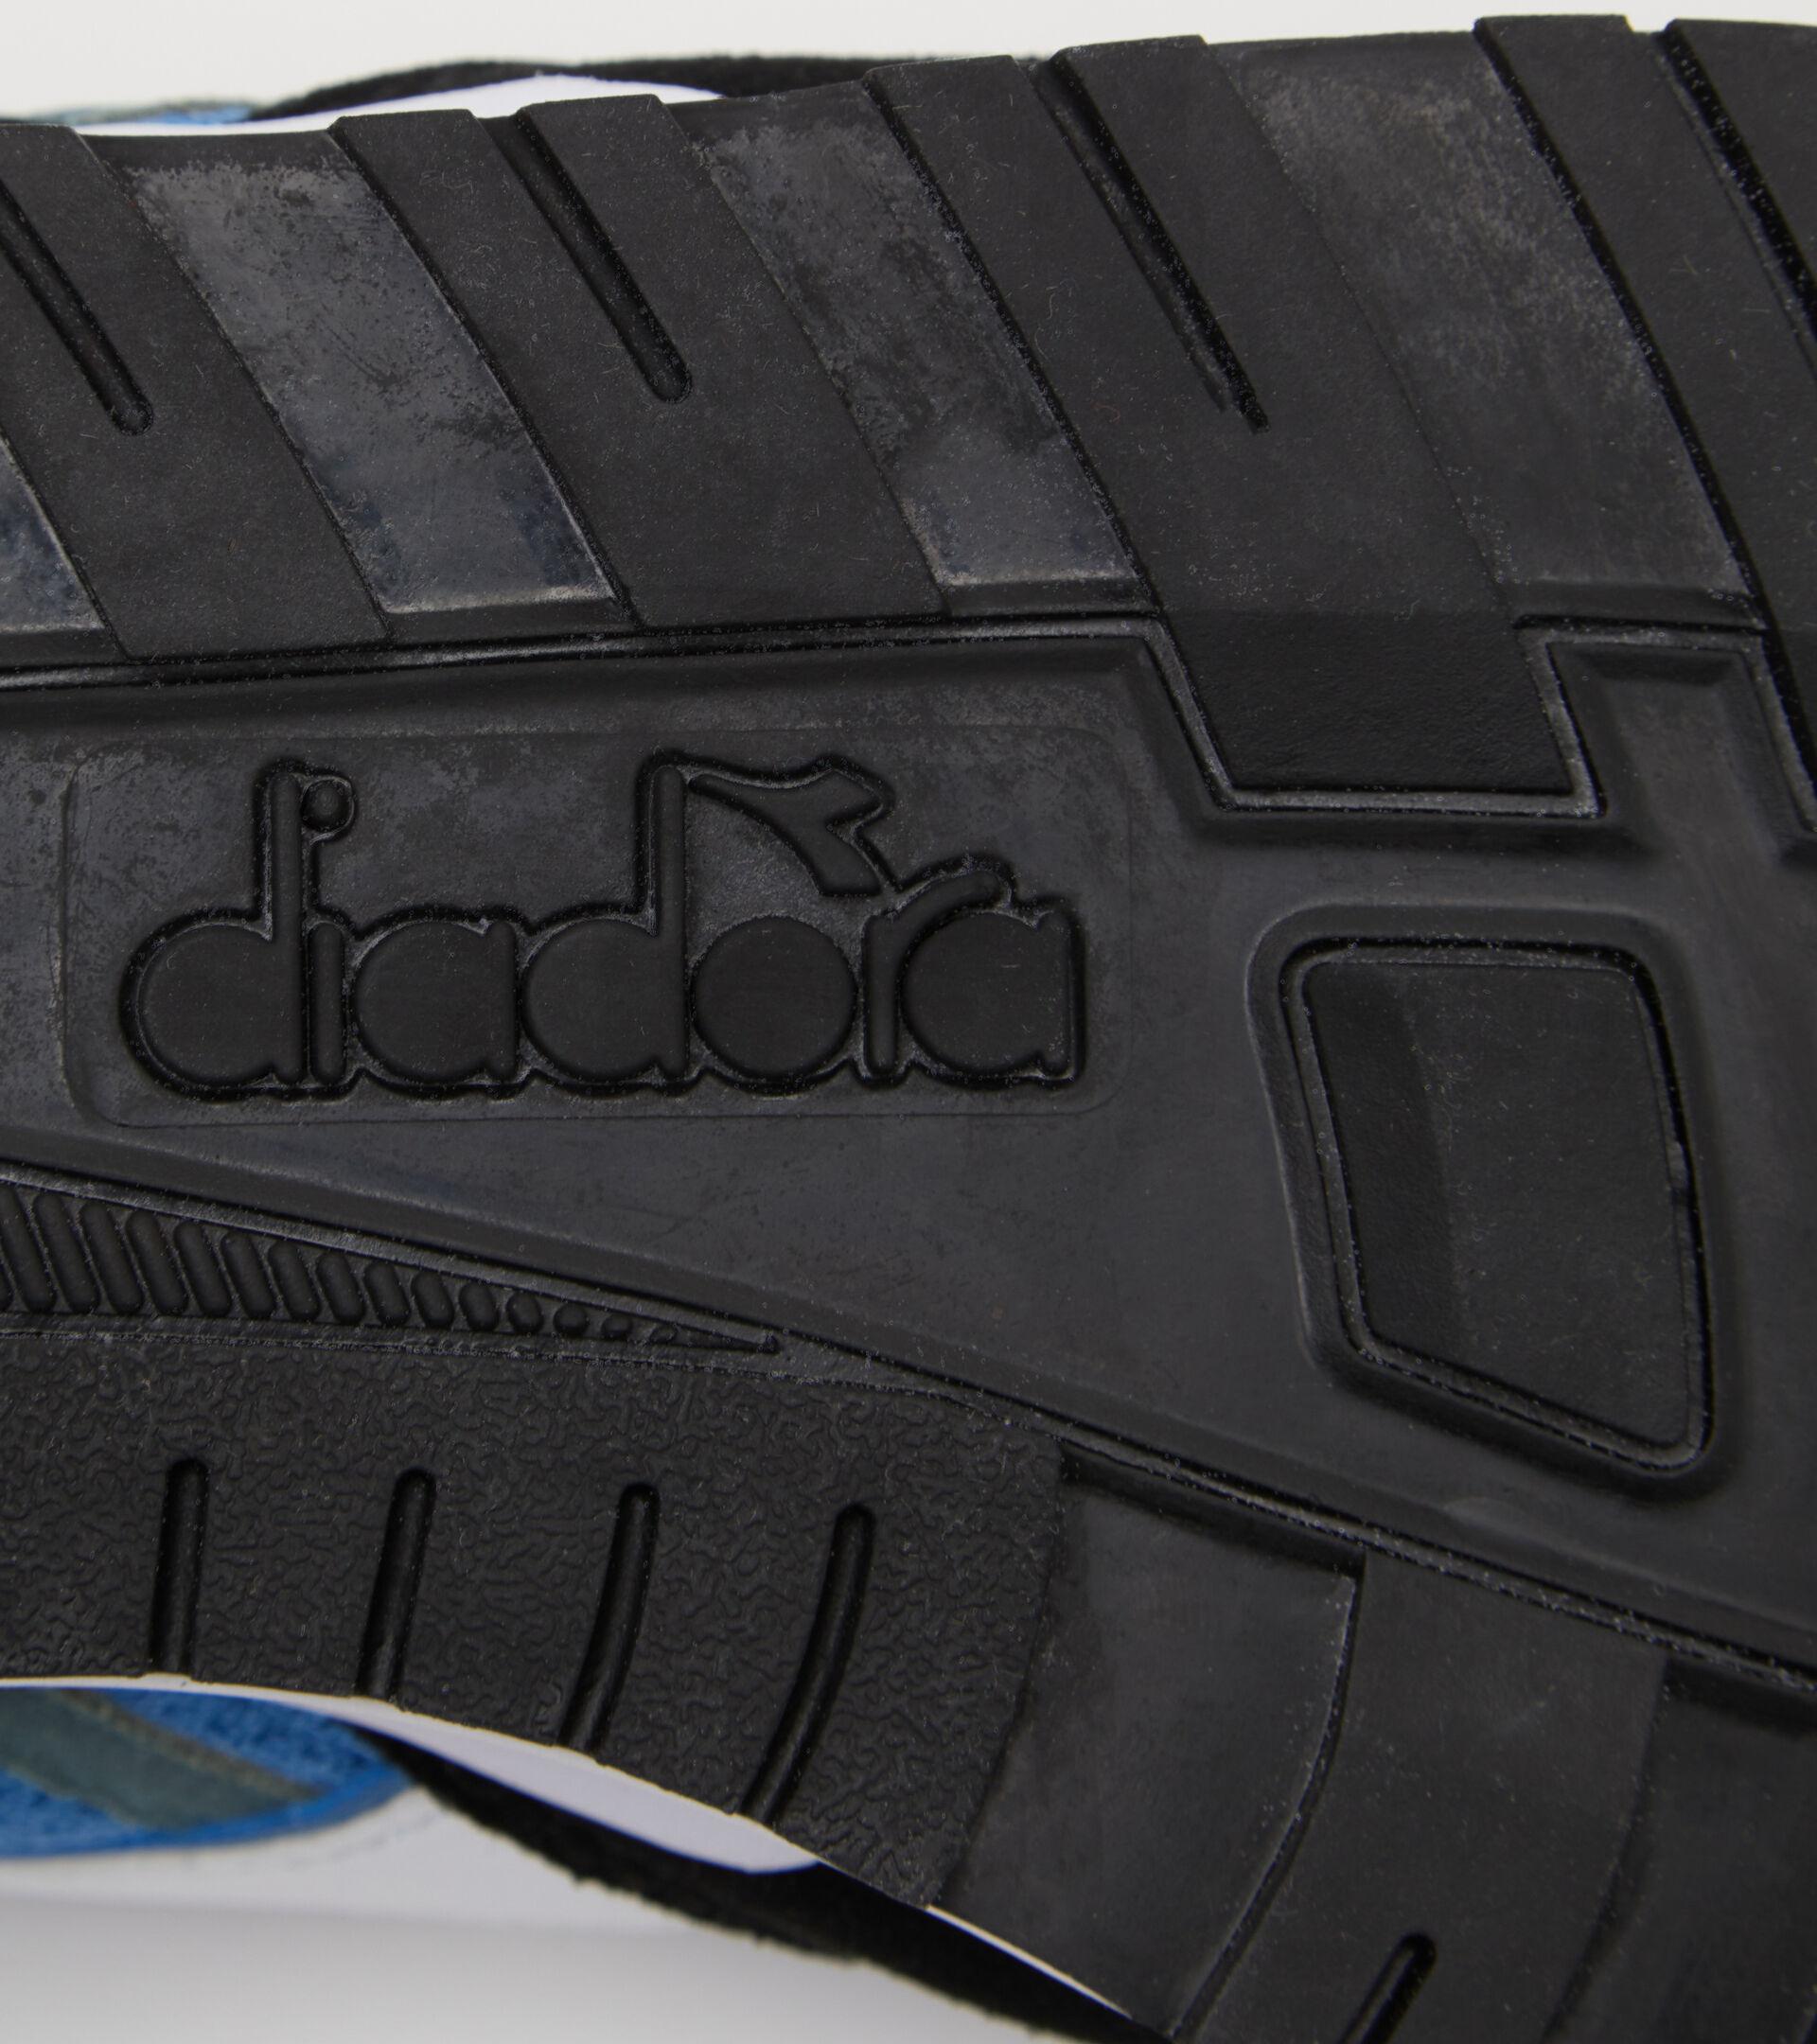 Scarpa sportiva - Unisex N902 S BLU VALLARTA/NERO - Diadora